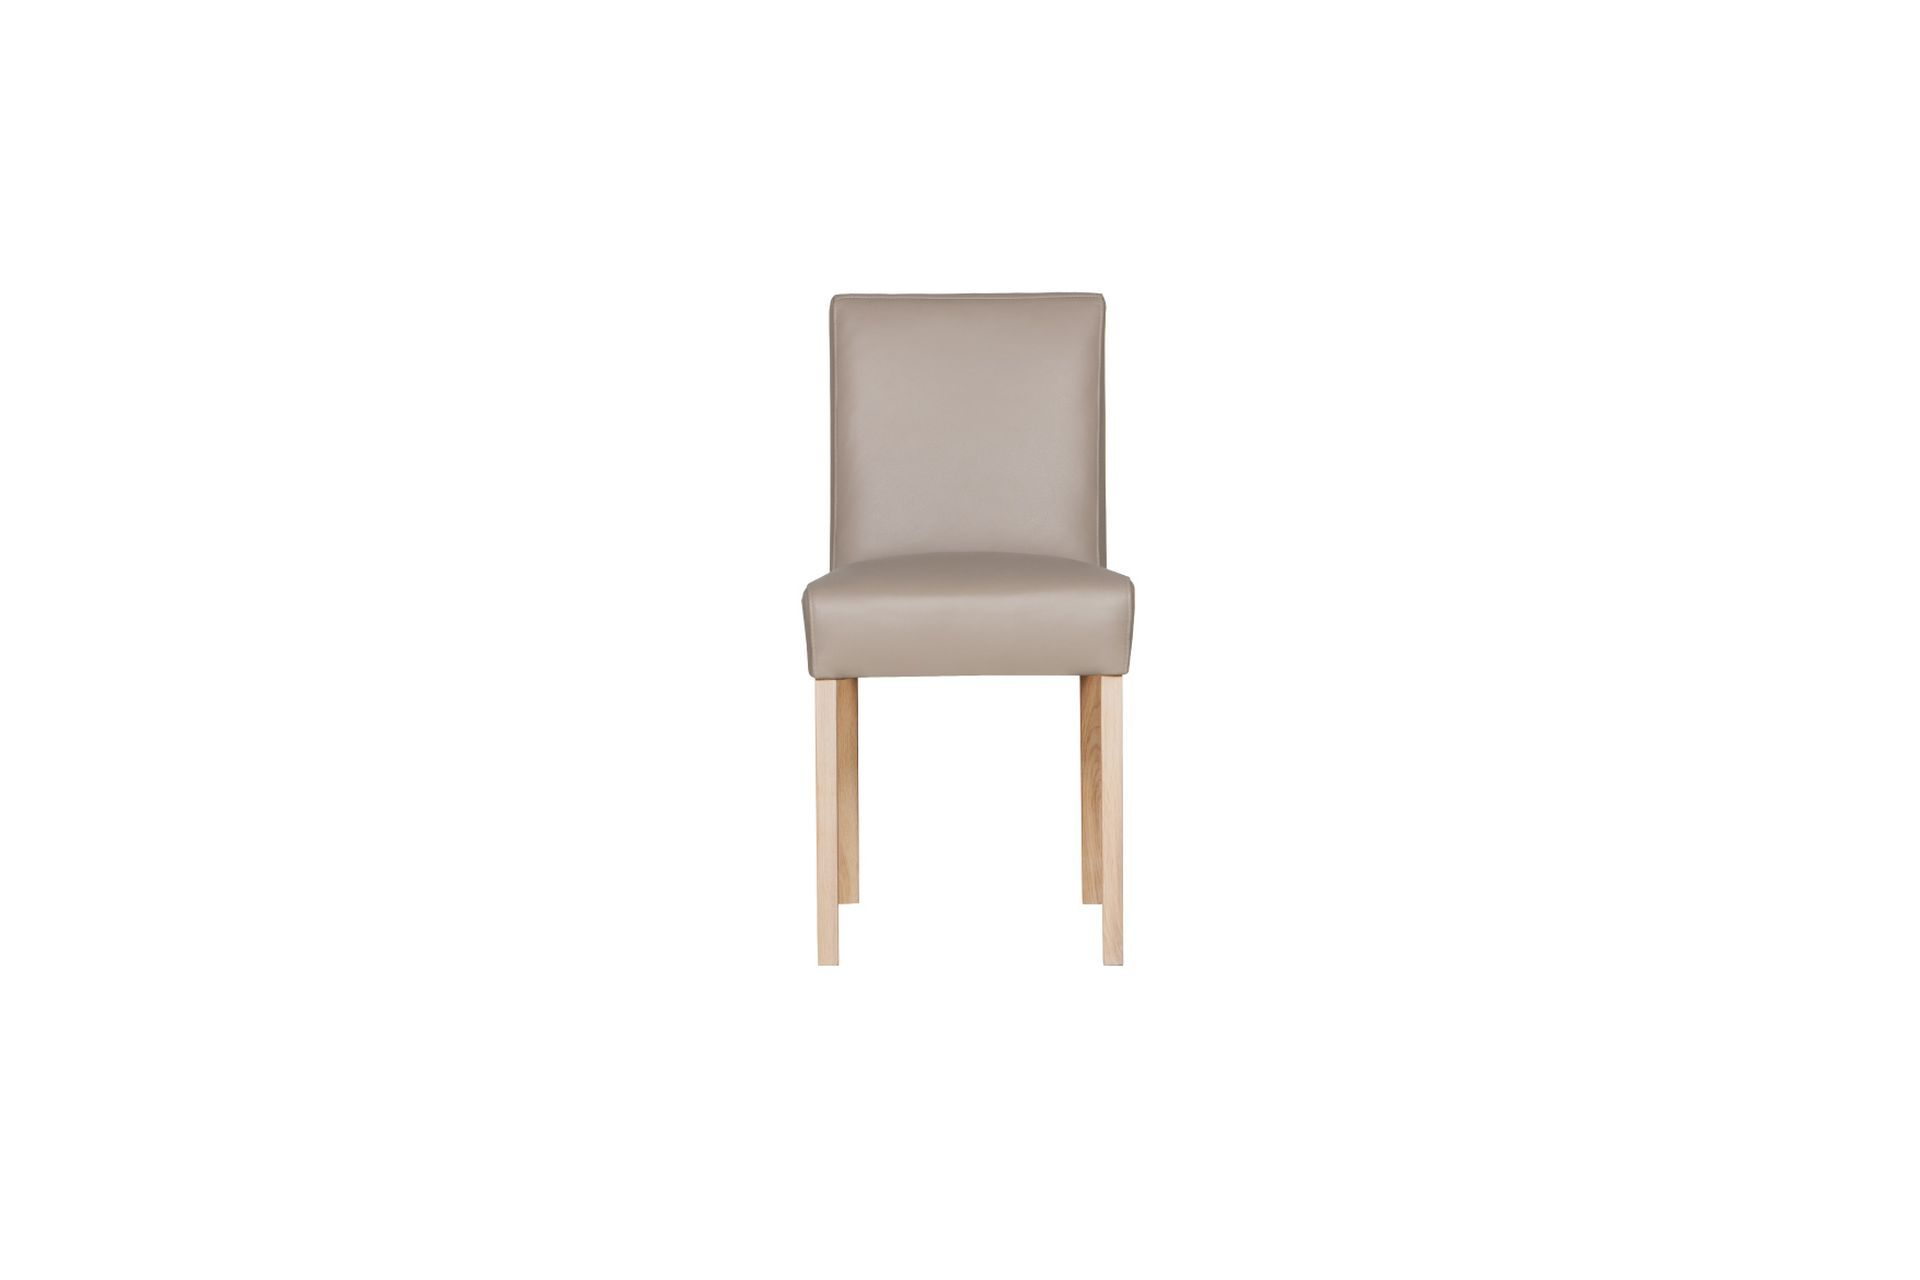 Кухонный стул Sits 15447050 от thefurnish